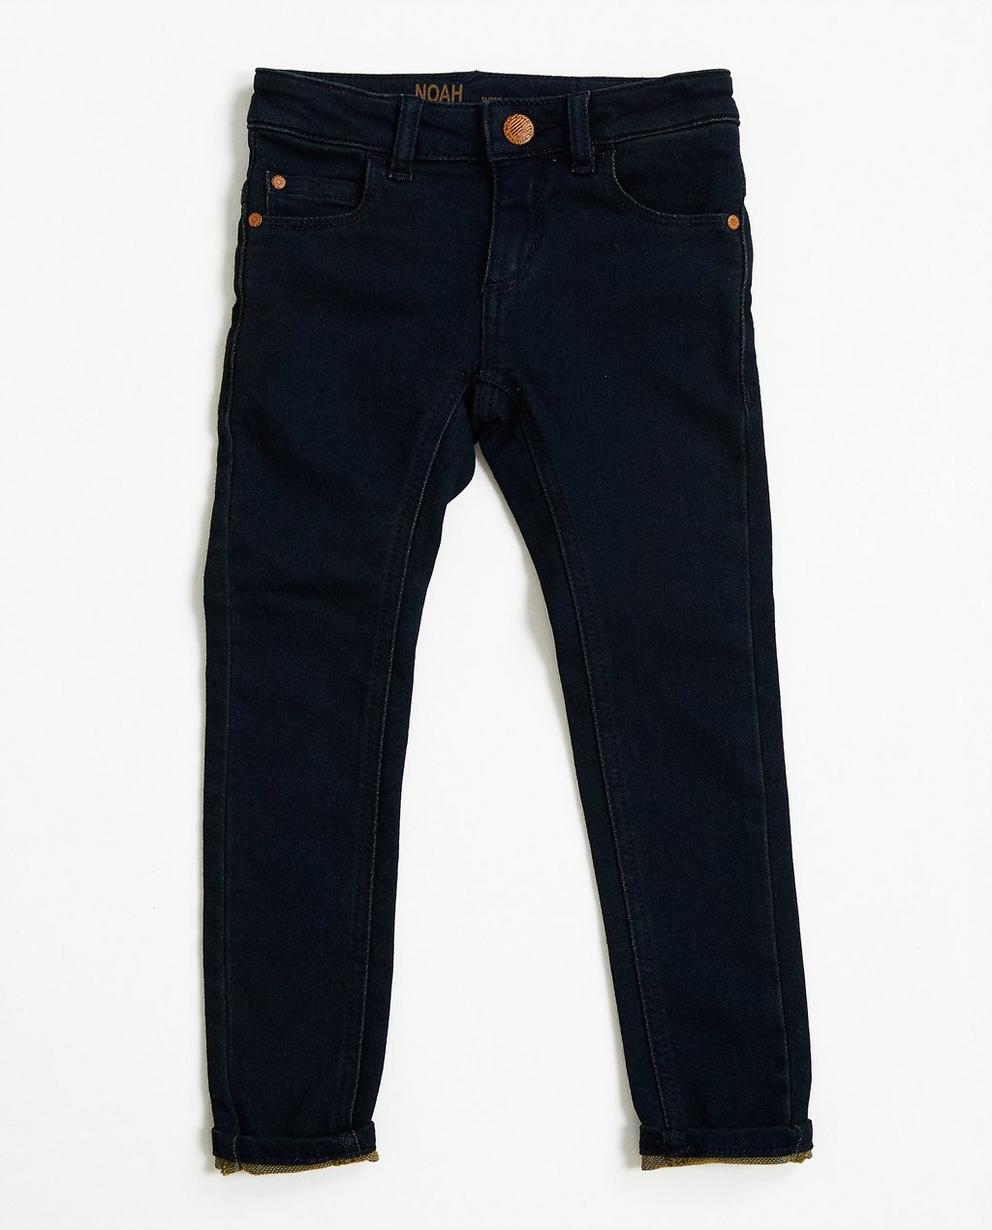 Nachtblaue Jeans - Super Skinny-Schnittform - JBC